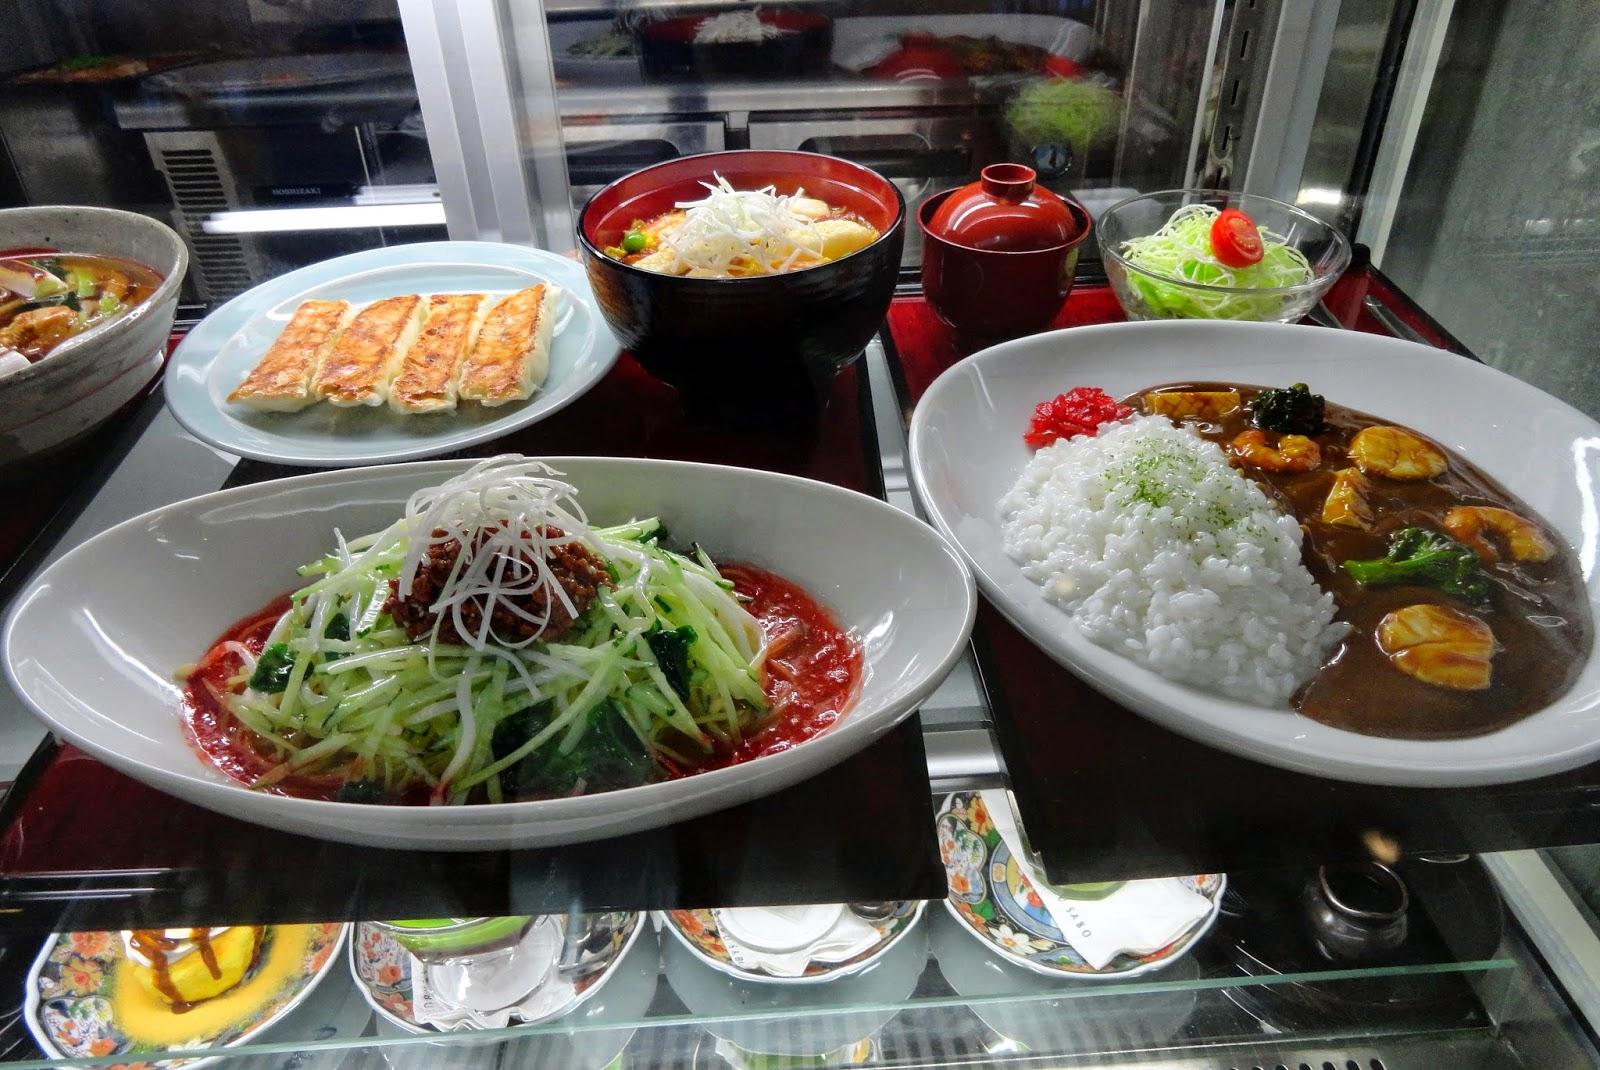 Plastic Food Display in China